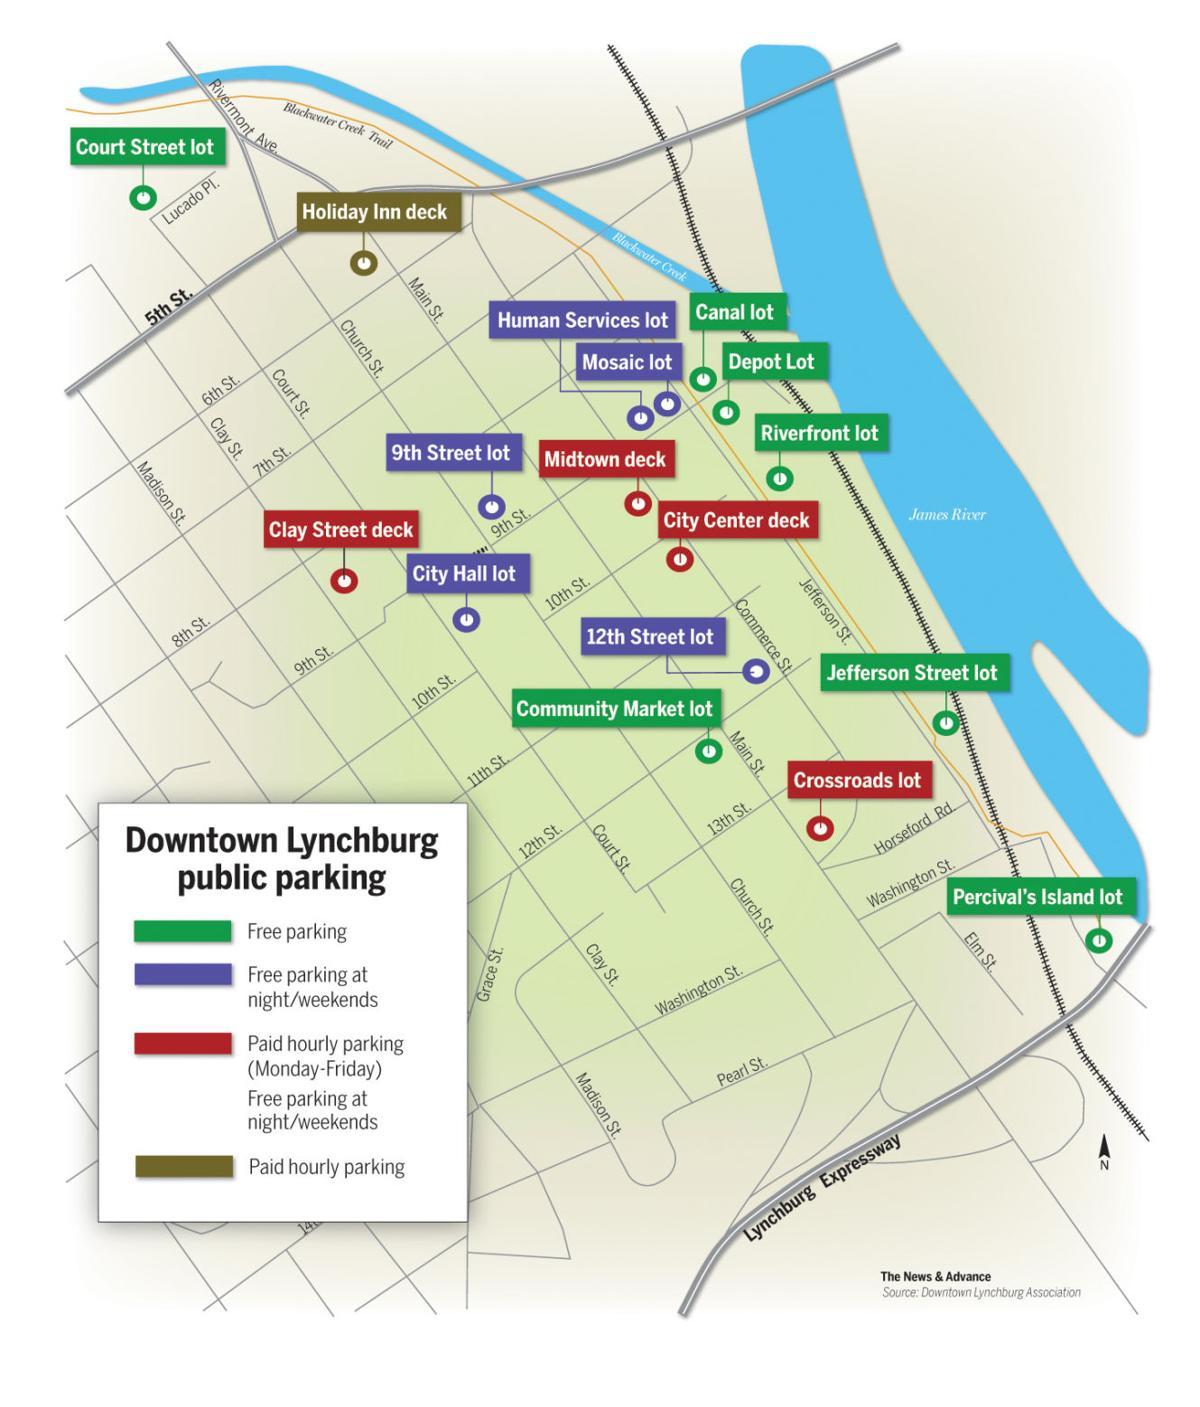 Lynchburg Hopes New Signs Clarify Downtown Parking